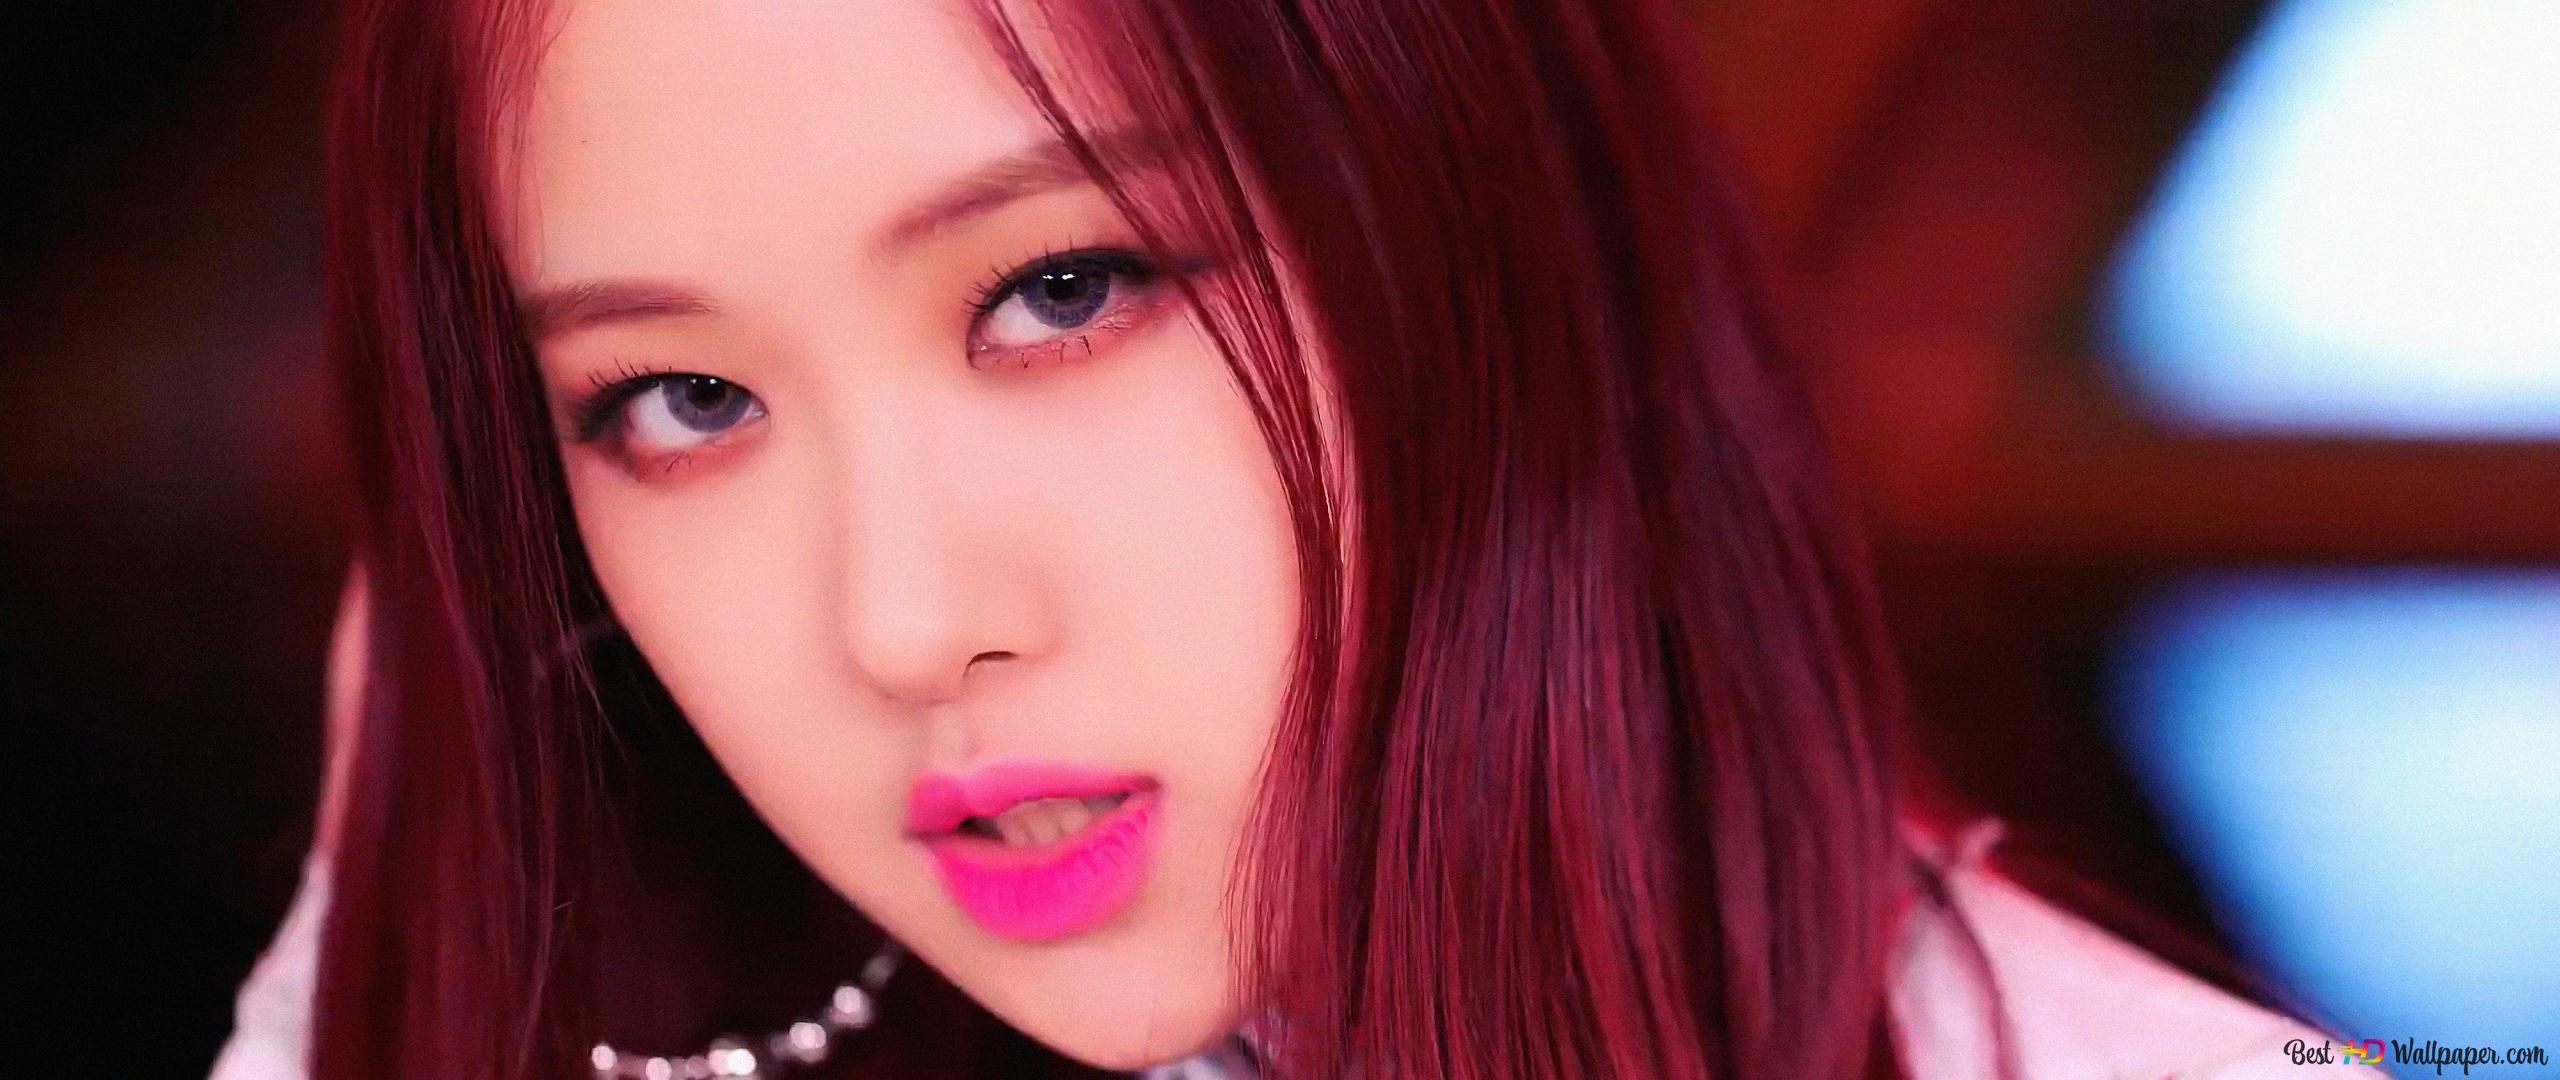 Korean Singer Rose From Blackpink Hd Wallpaper Download